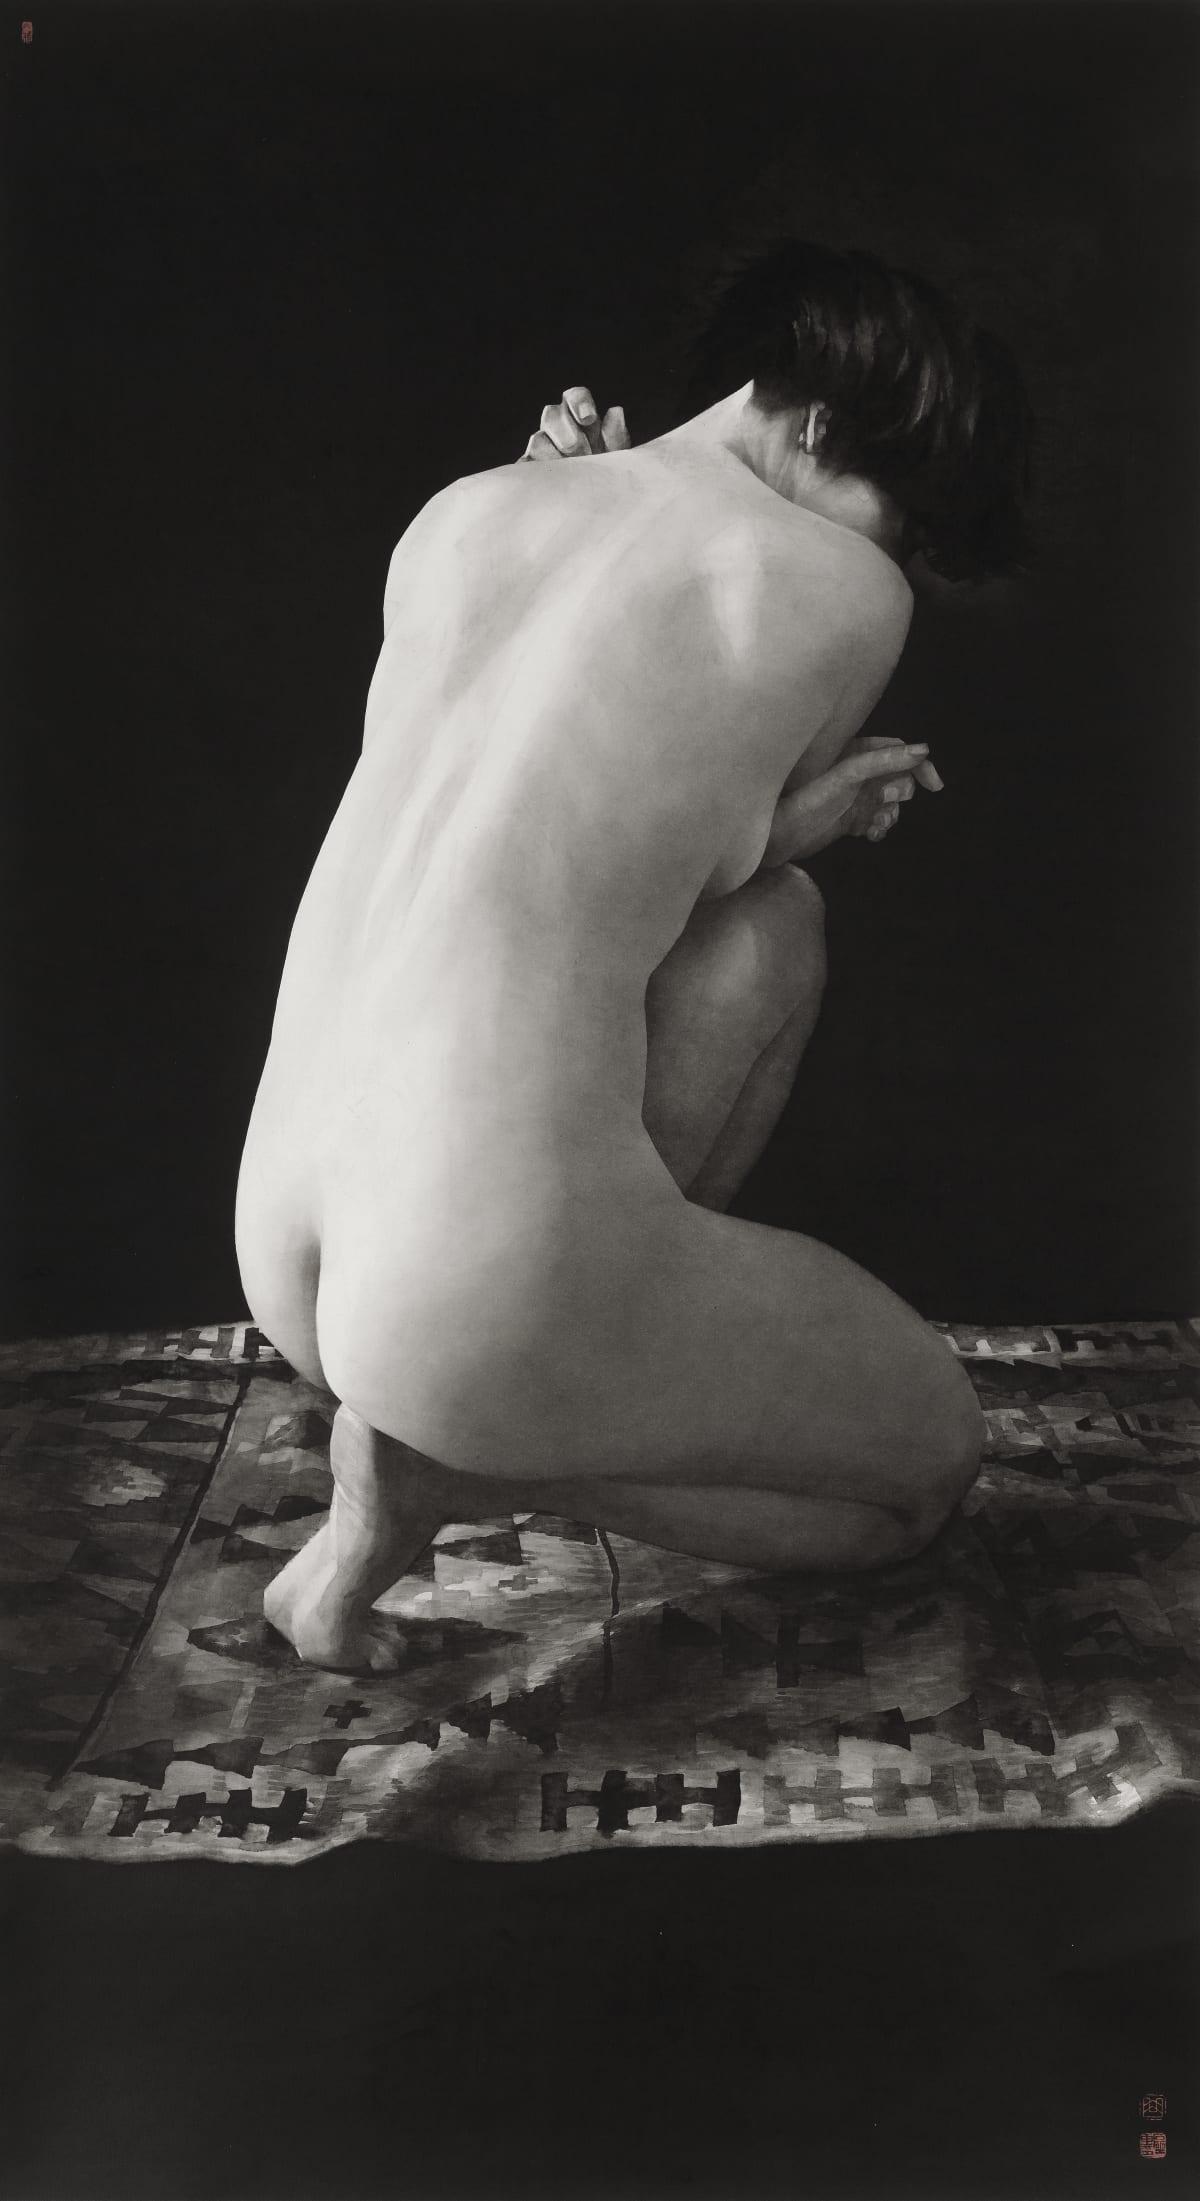 Qu Leilei 曲磊磊, Squatting Figure, 2018